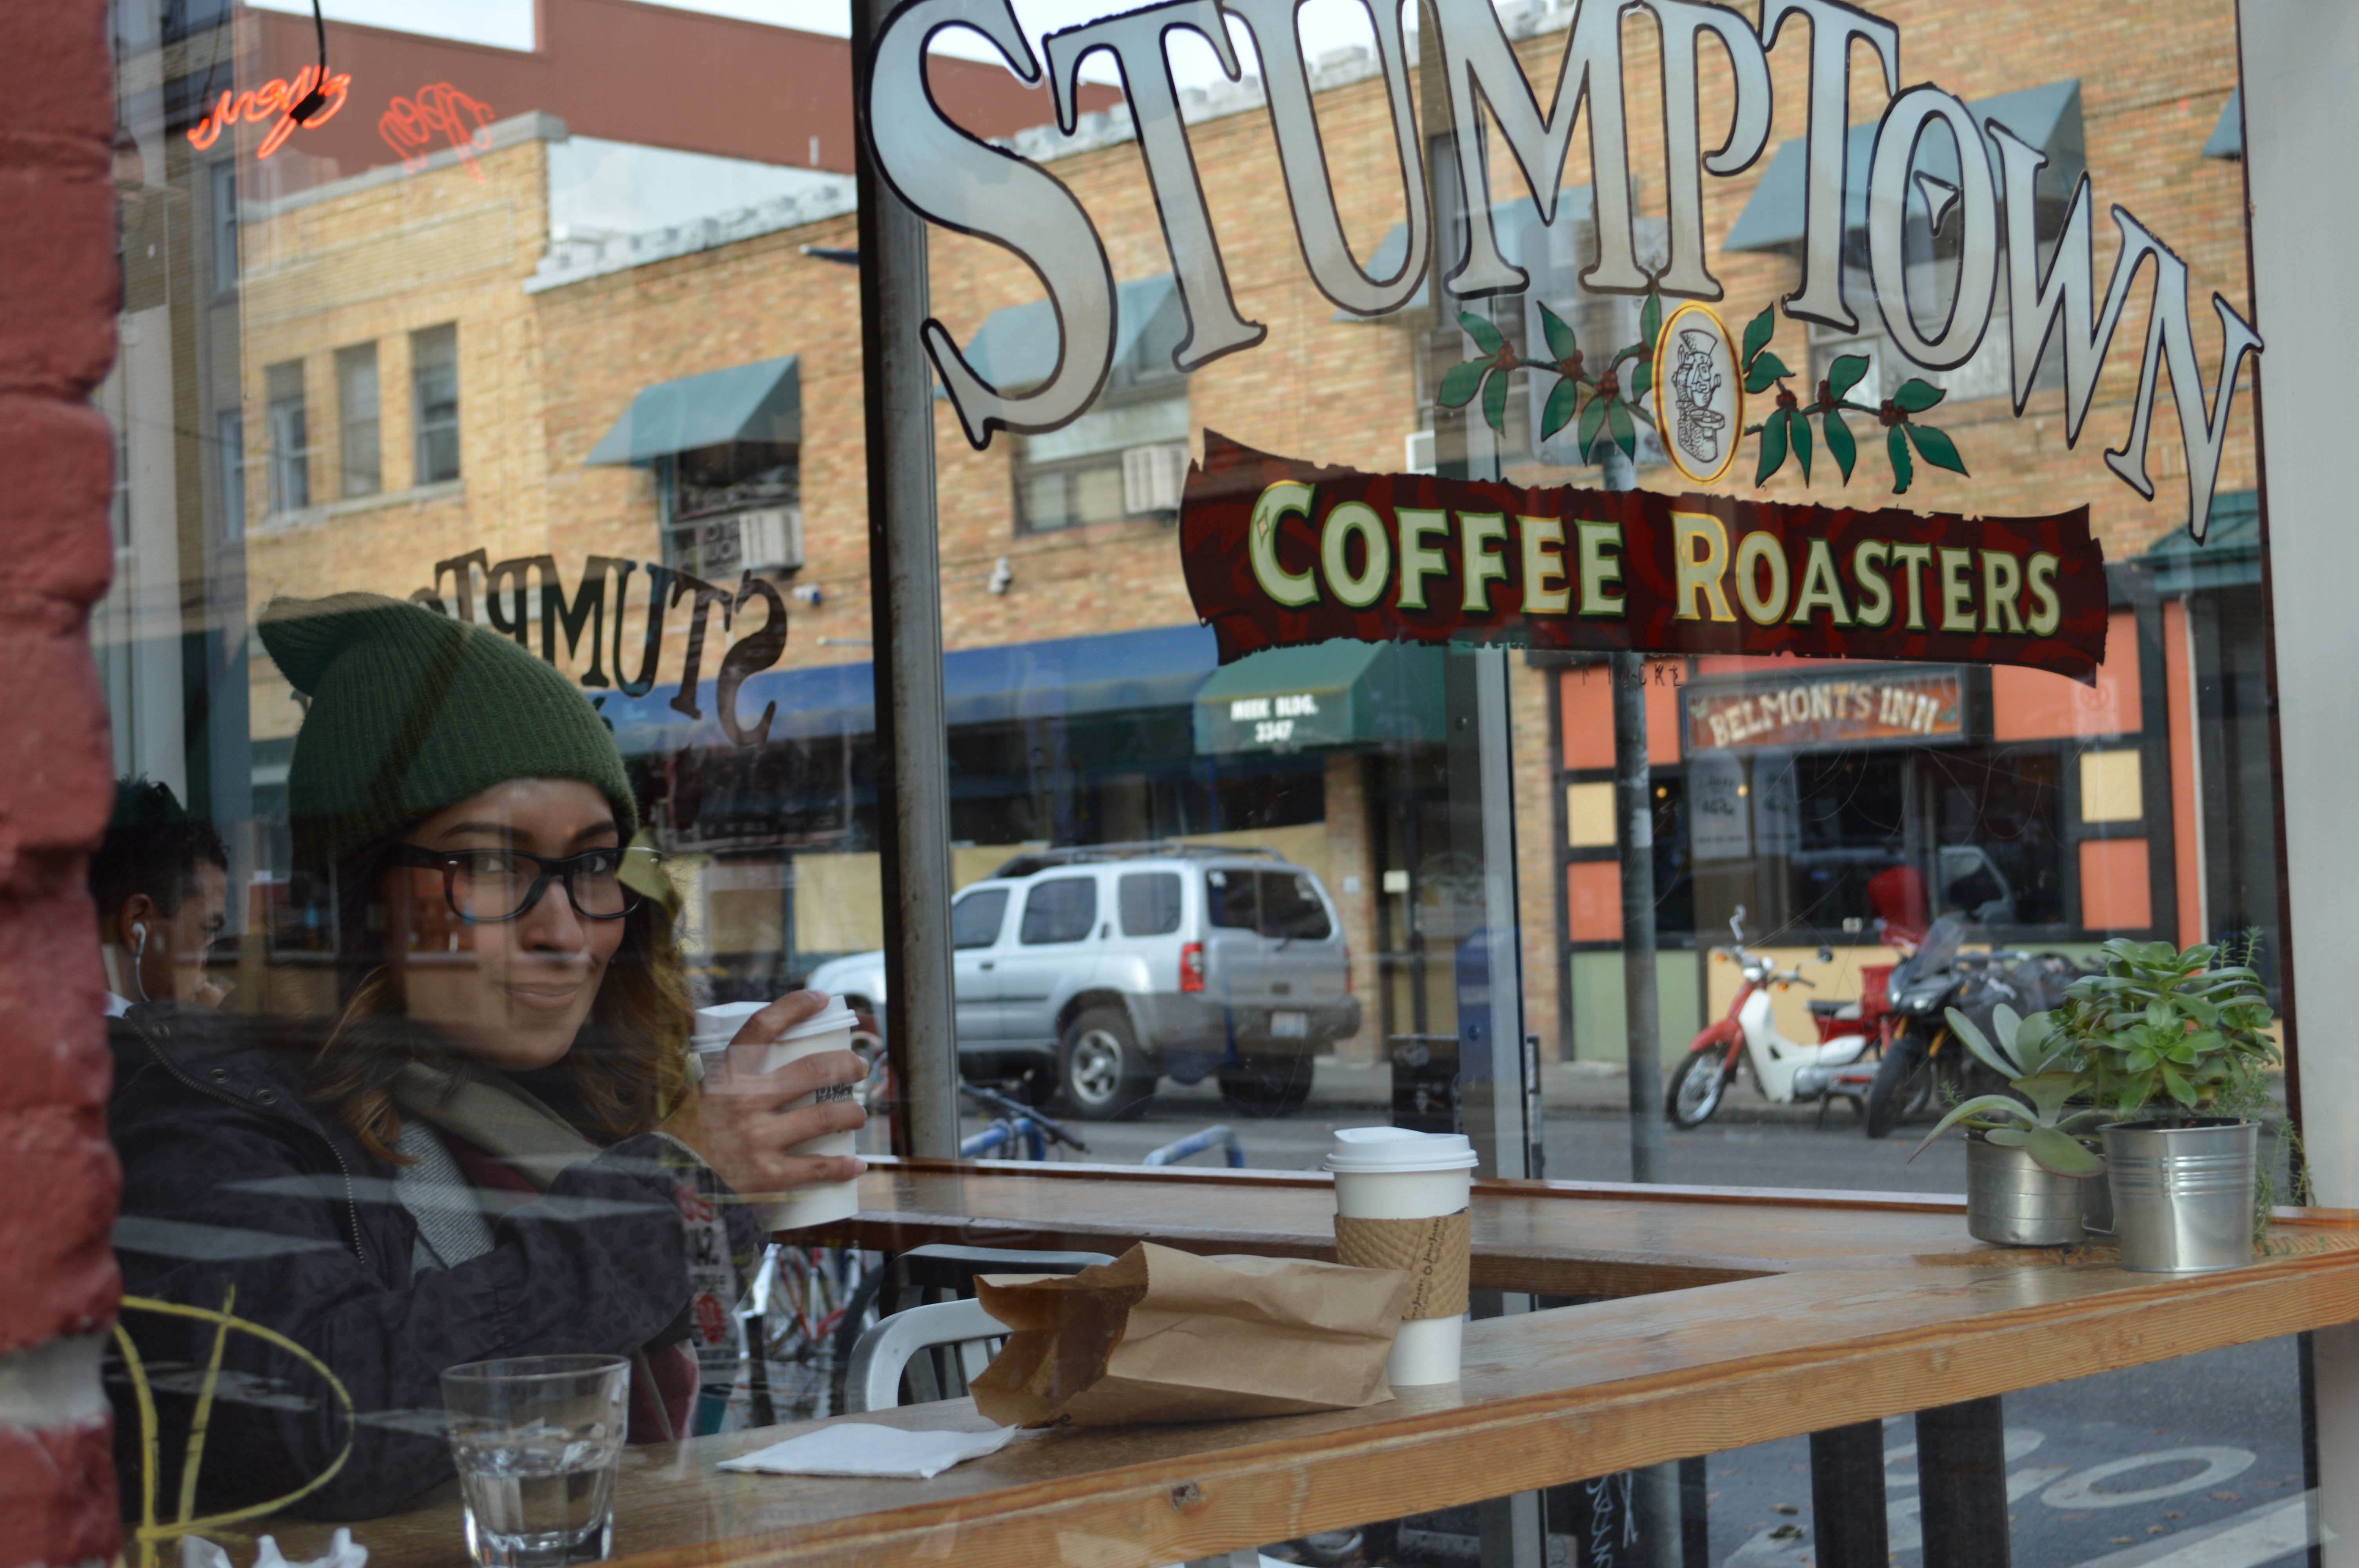 Stumptown coffee roasters on belmont for some warm yummy